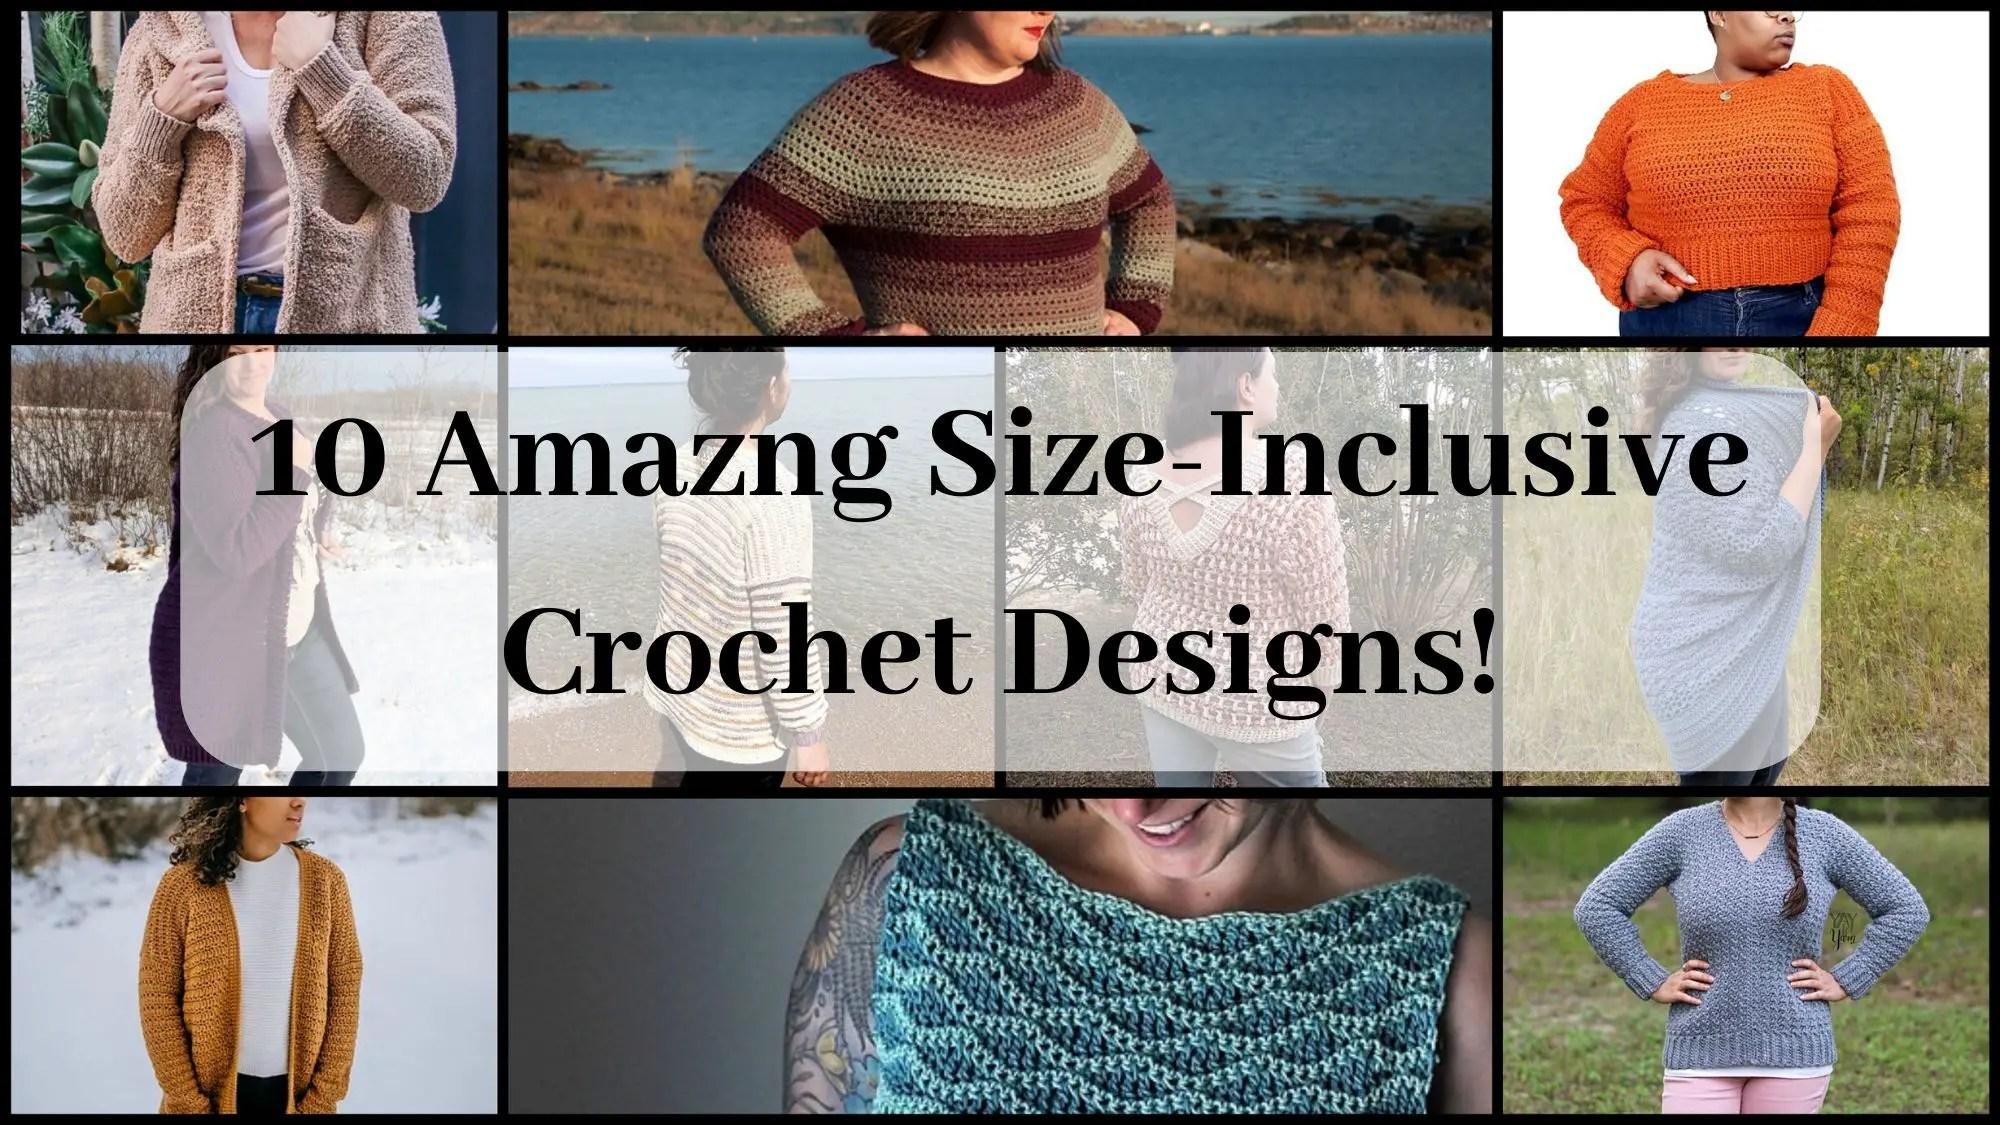 10 Amazing Size-Inclusive Crochet Designs!